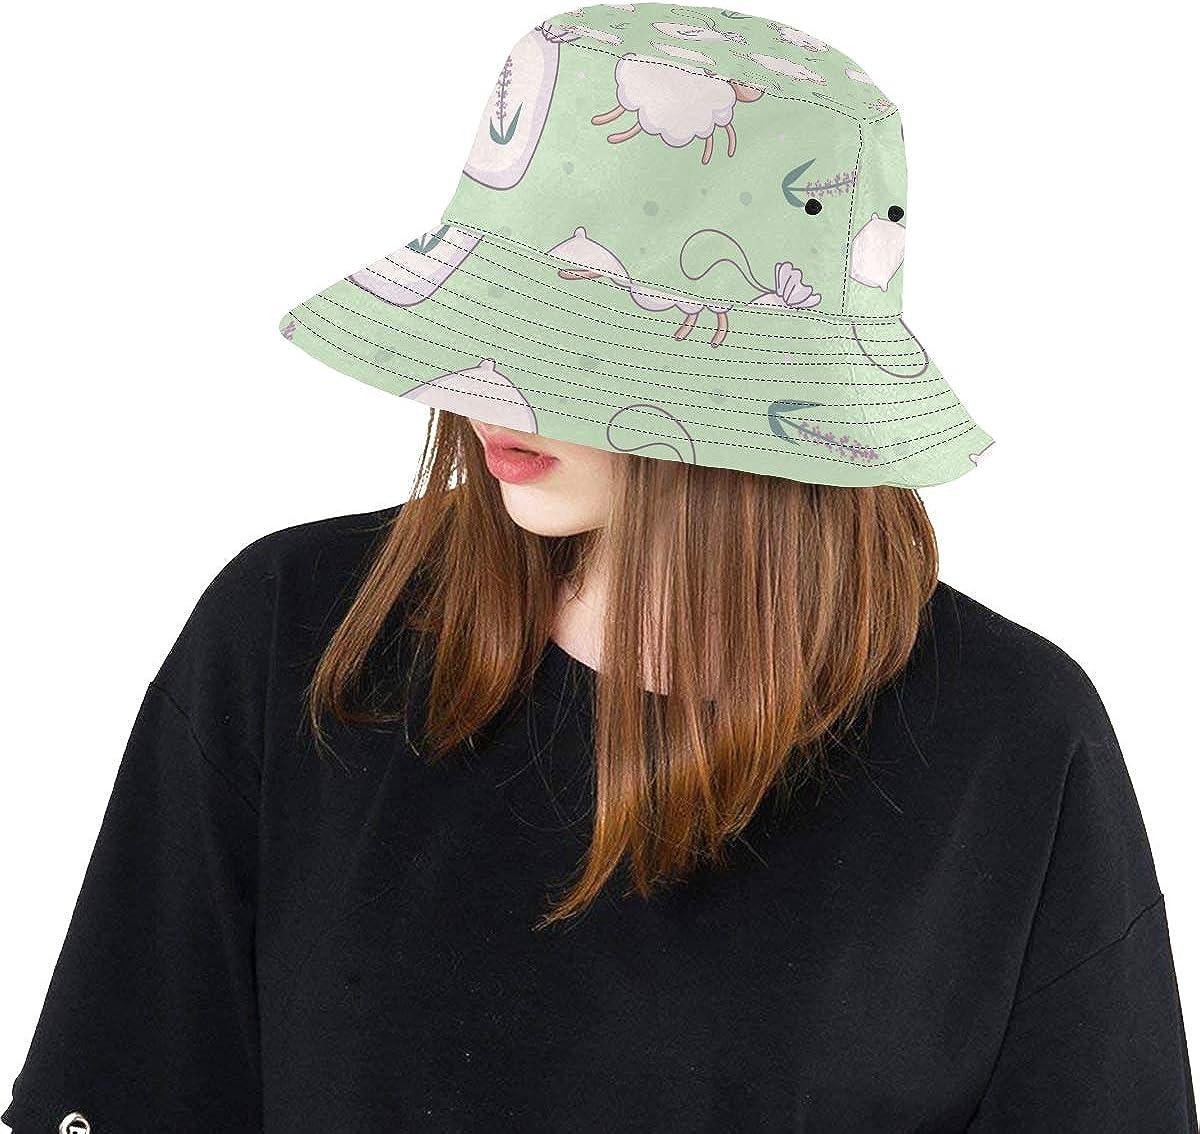 Top Hats Summer Cool Bucket Hat Adorable Jumping Cute Sheep Adjustable Fisherman Cap Hiking Rain Picnic Caps for Toddler Fisherman